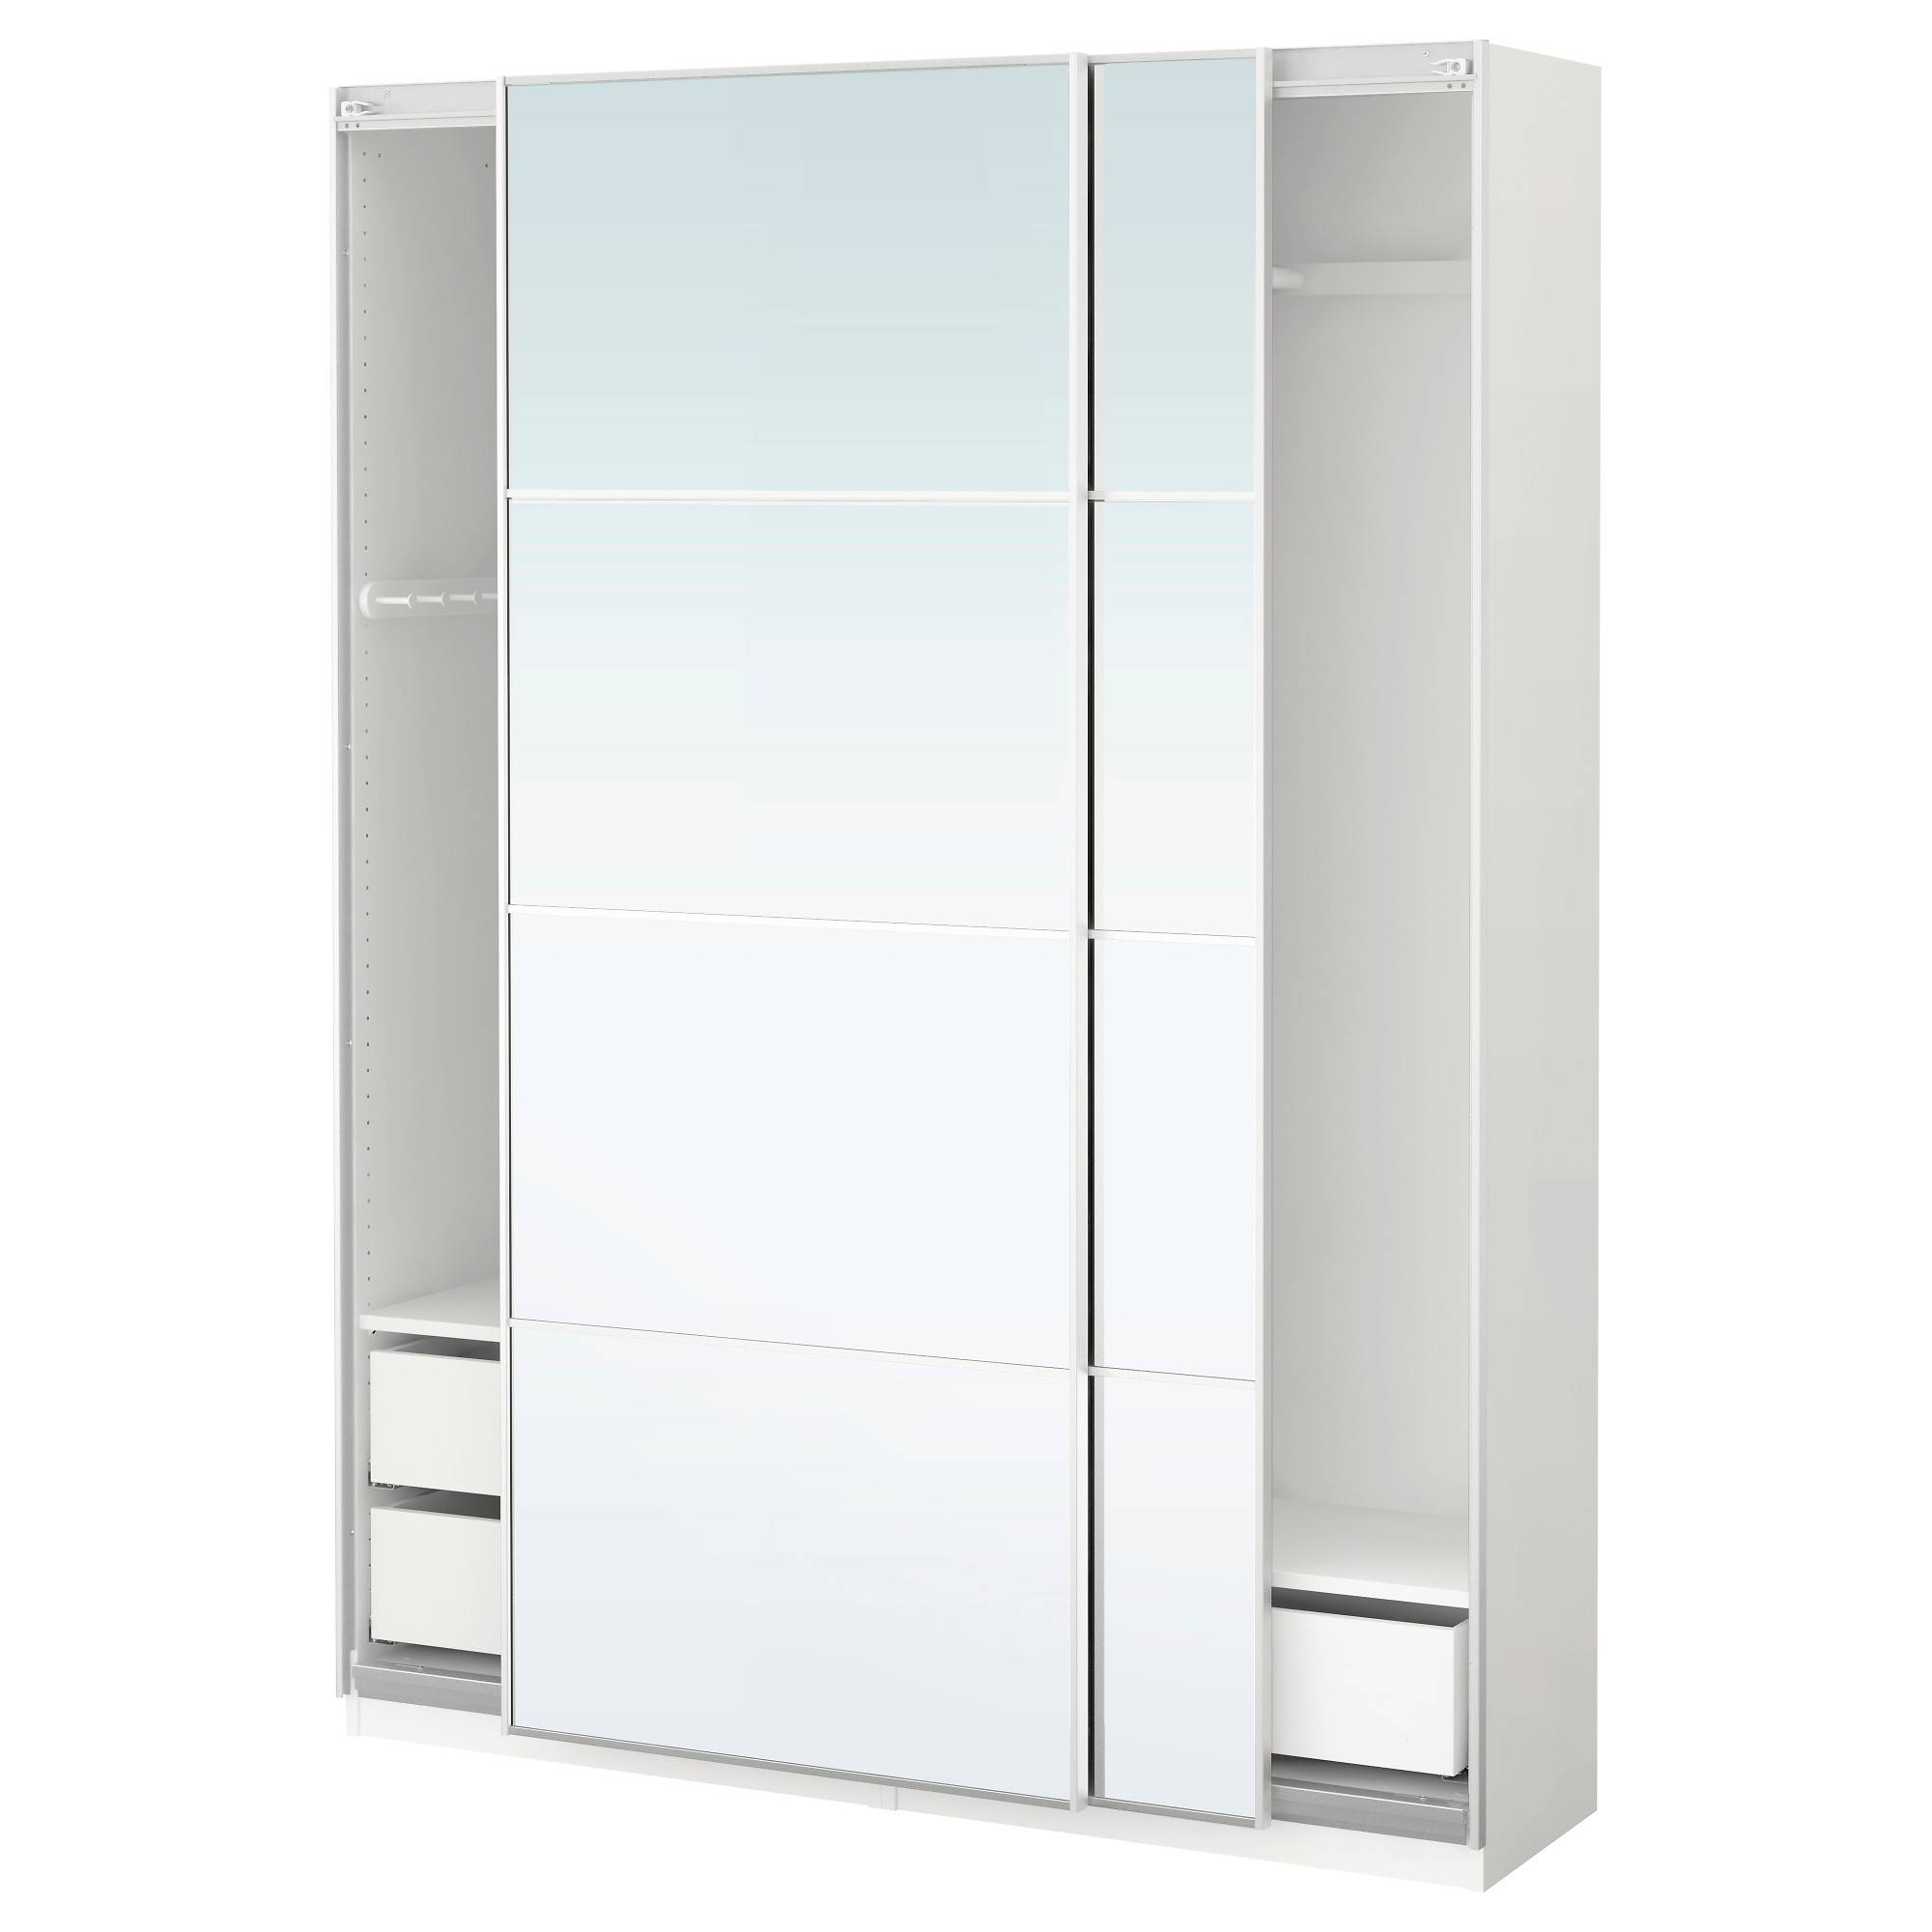 Pax Wardrobe White/auli Mirror Glass 150X44X201 Cm - Ikea inside Mirror Wardrobes (Image 8 of 15)